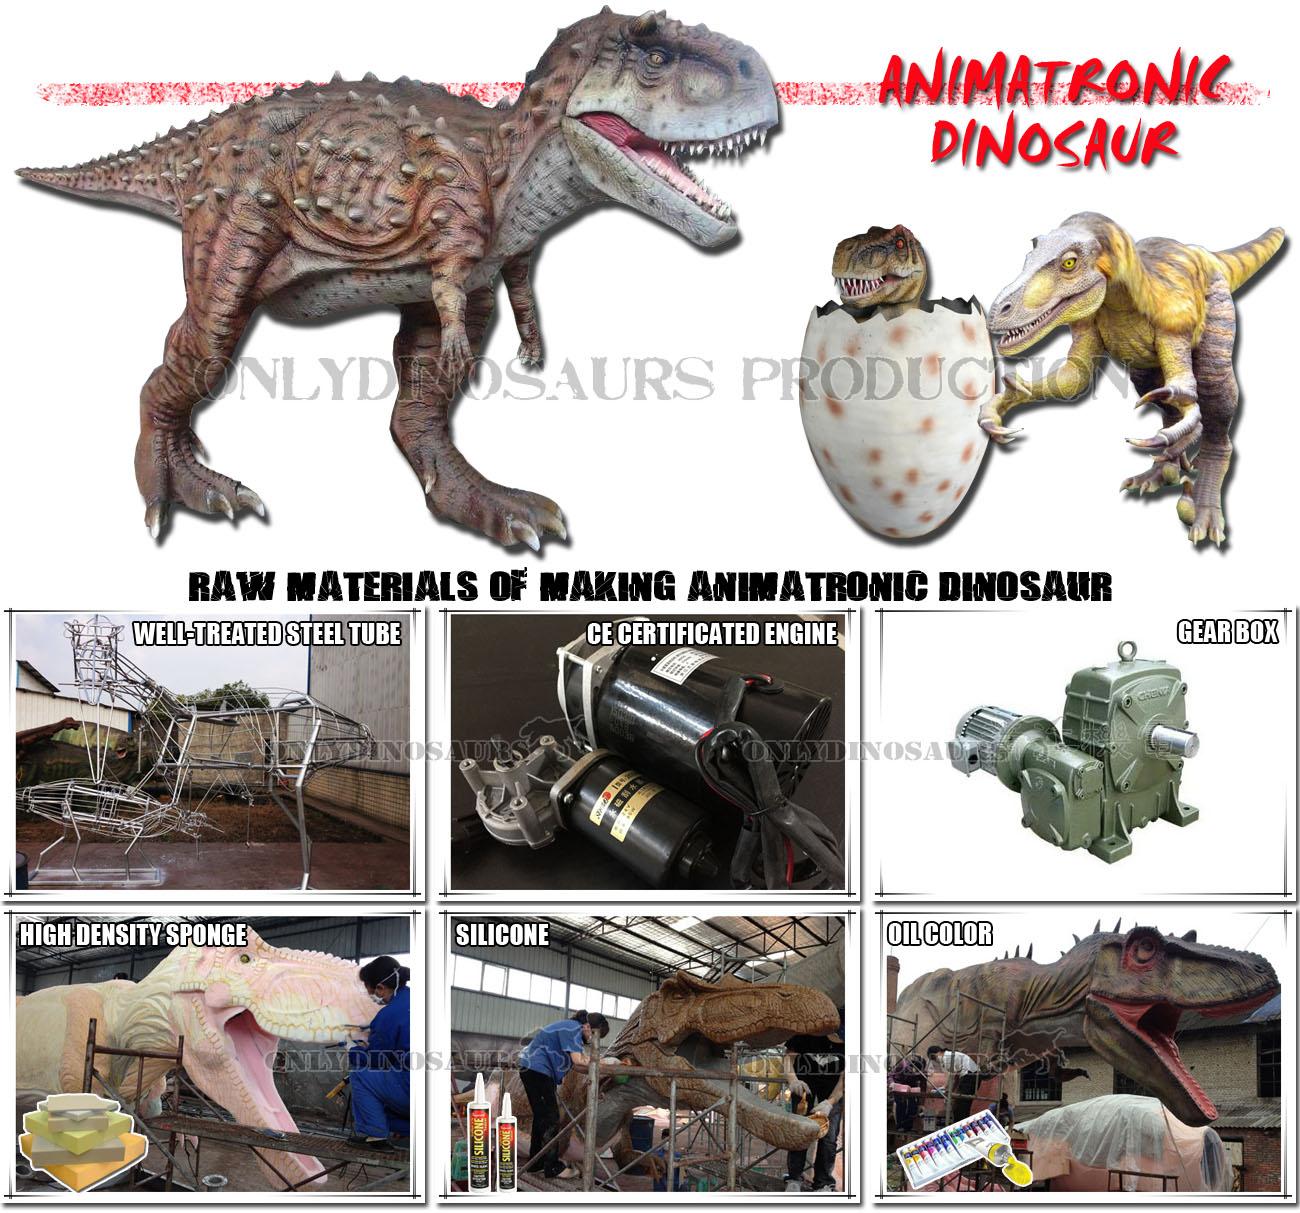 Raw Materials of Making Animatronic Dinosaur